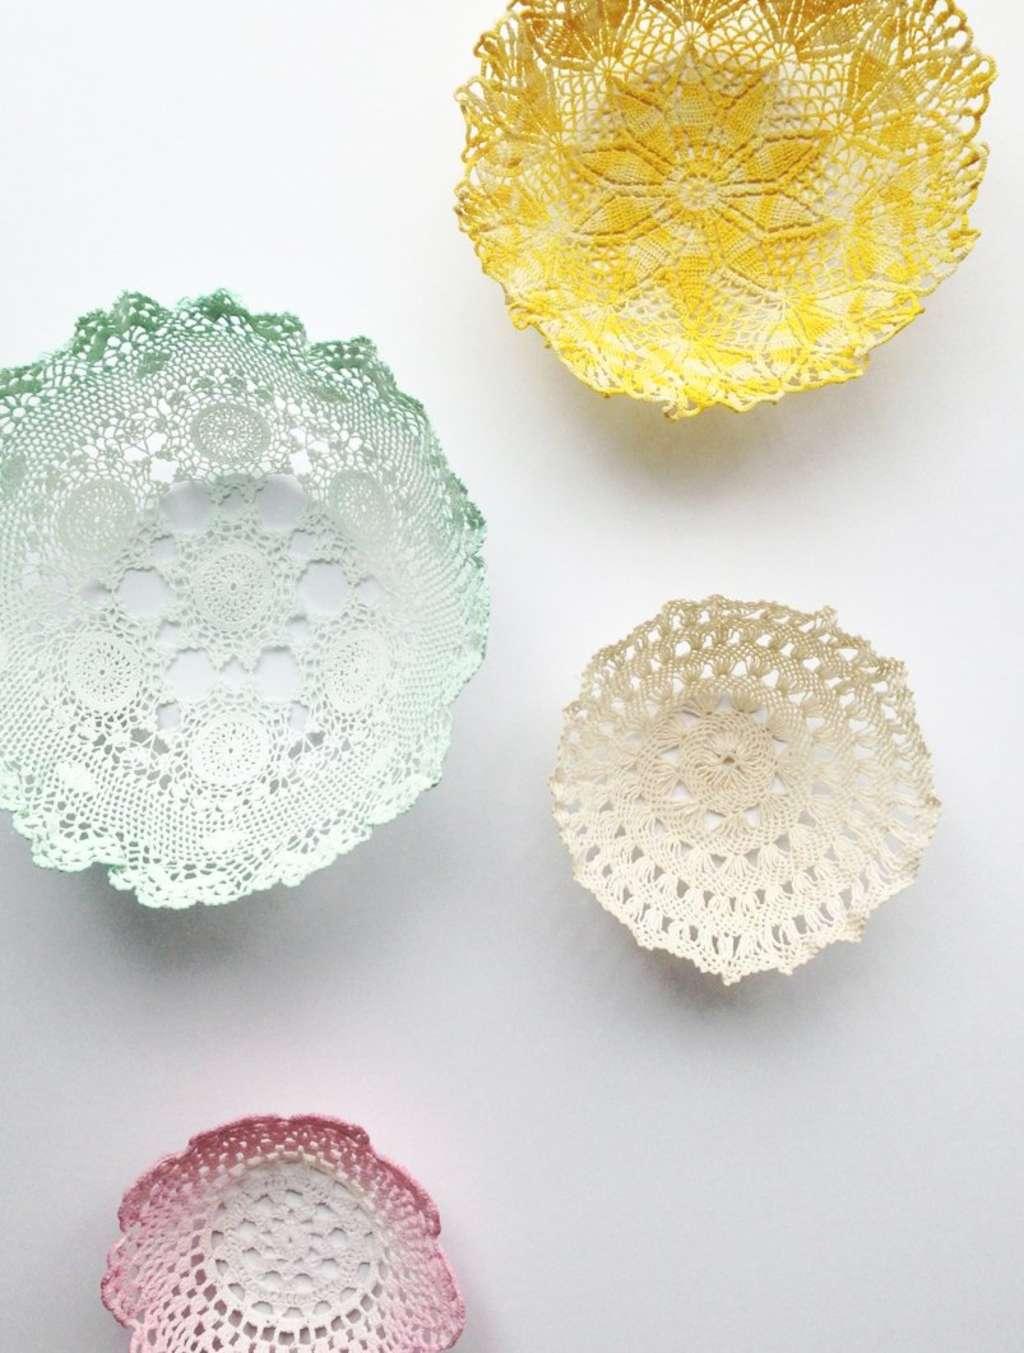 DIY Room Decor: Lace Doily Bowls